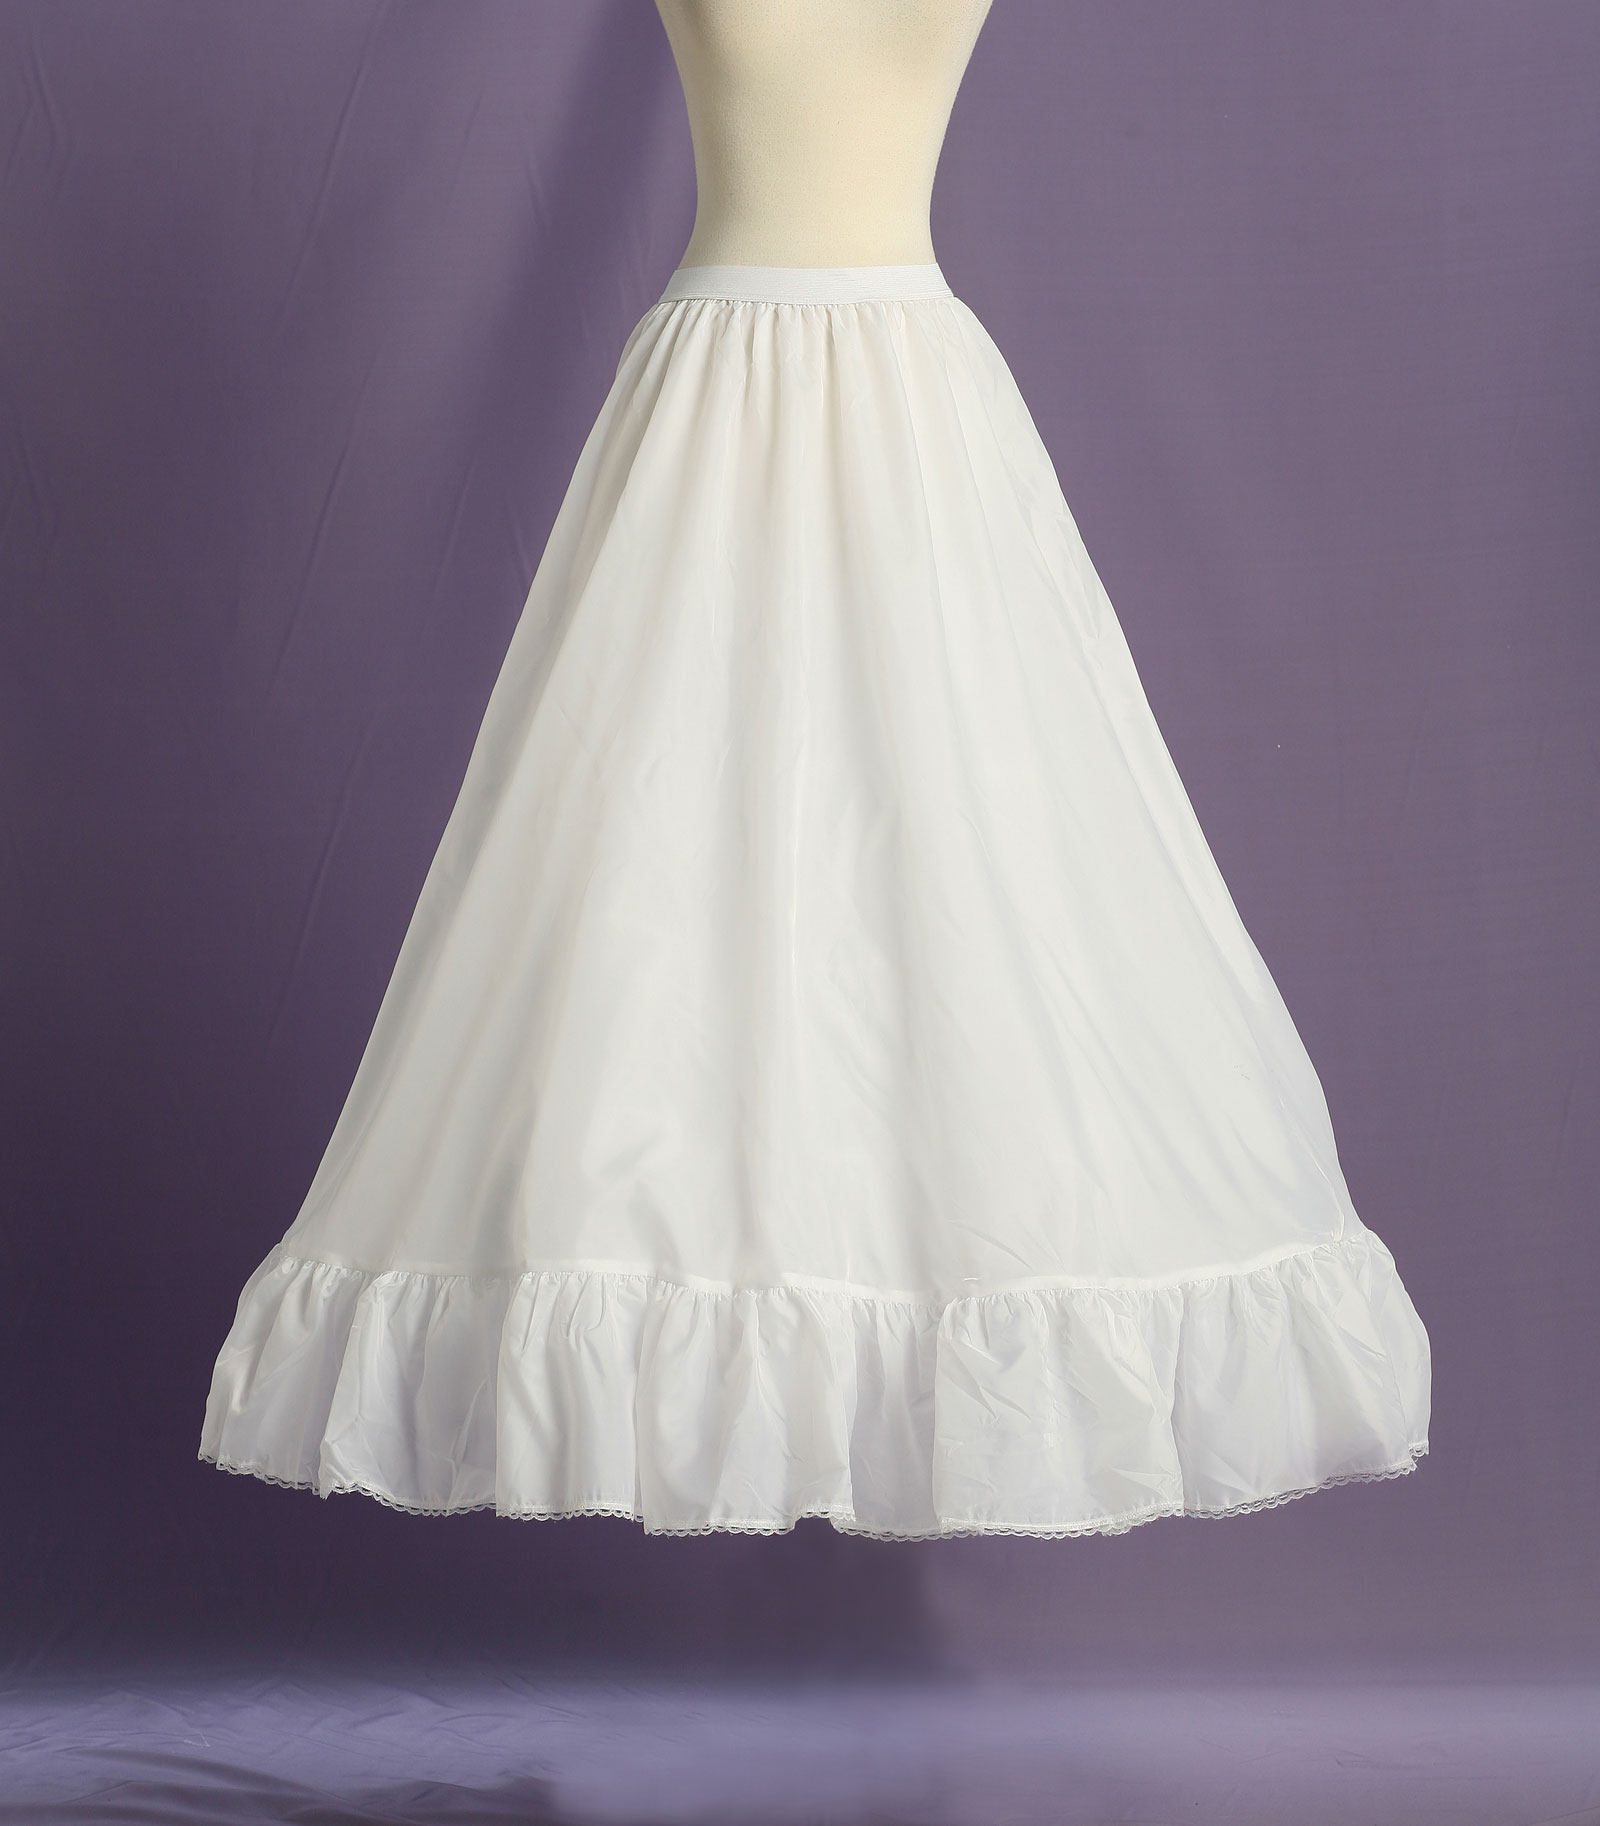 Flower girl petticoats